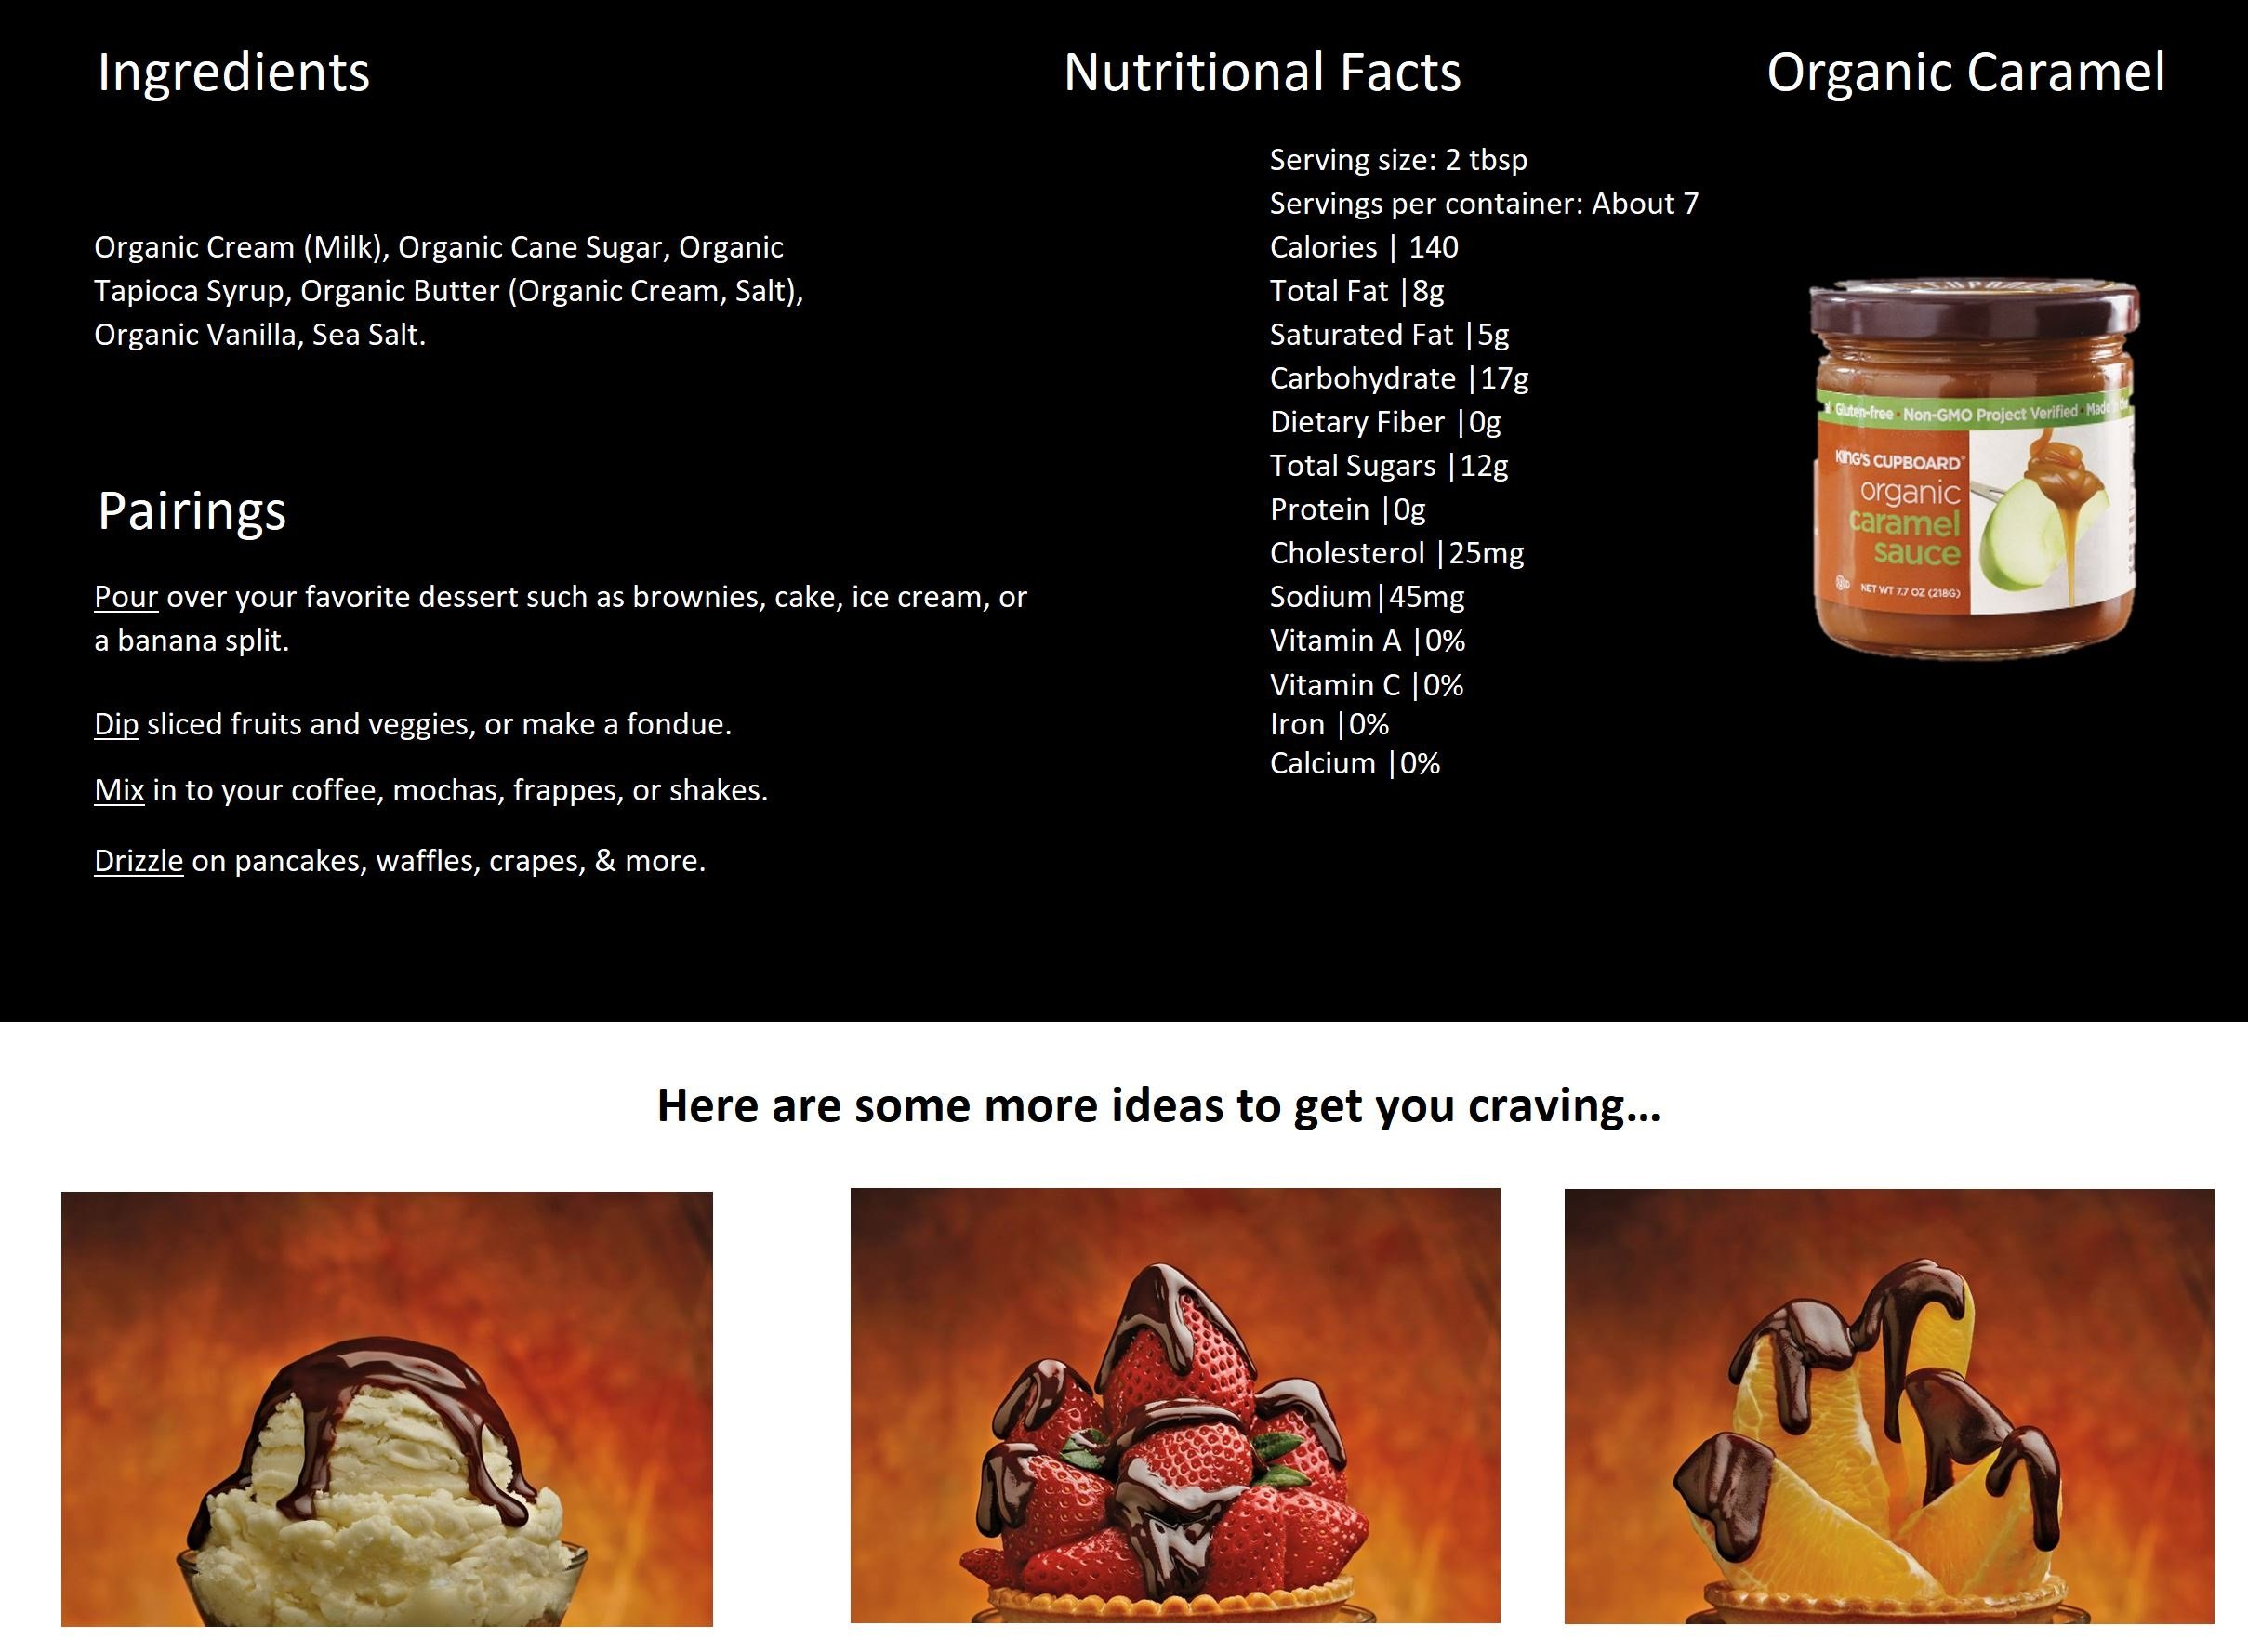 The King's Cupboard Original Organic Sampler Gift Set of Hot Fudge & Caramel Sauce by The King's Cupboard (Image #4)